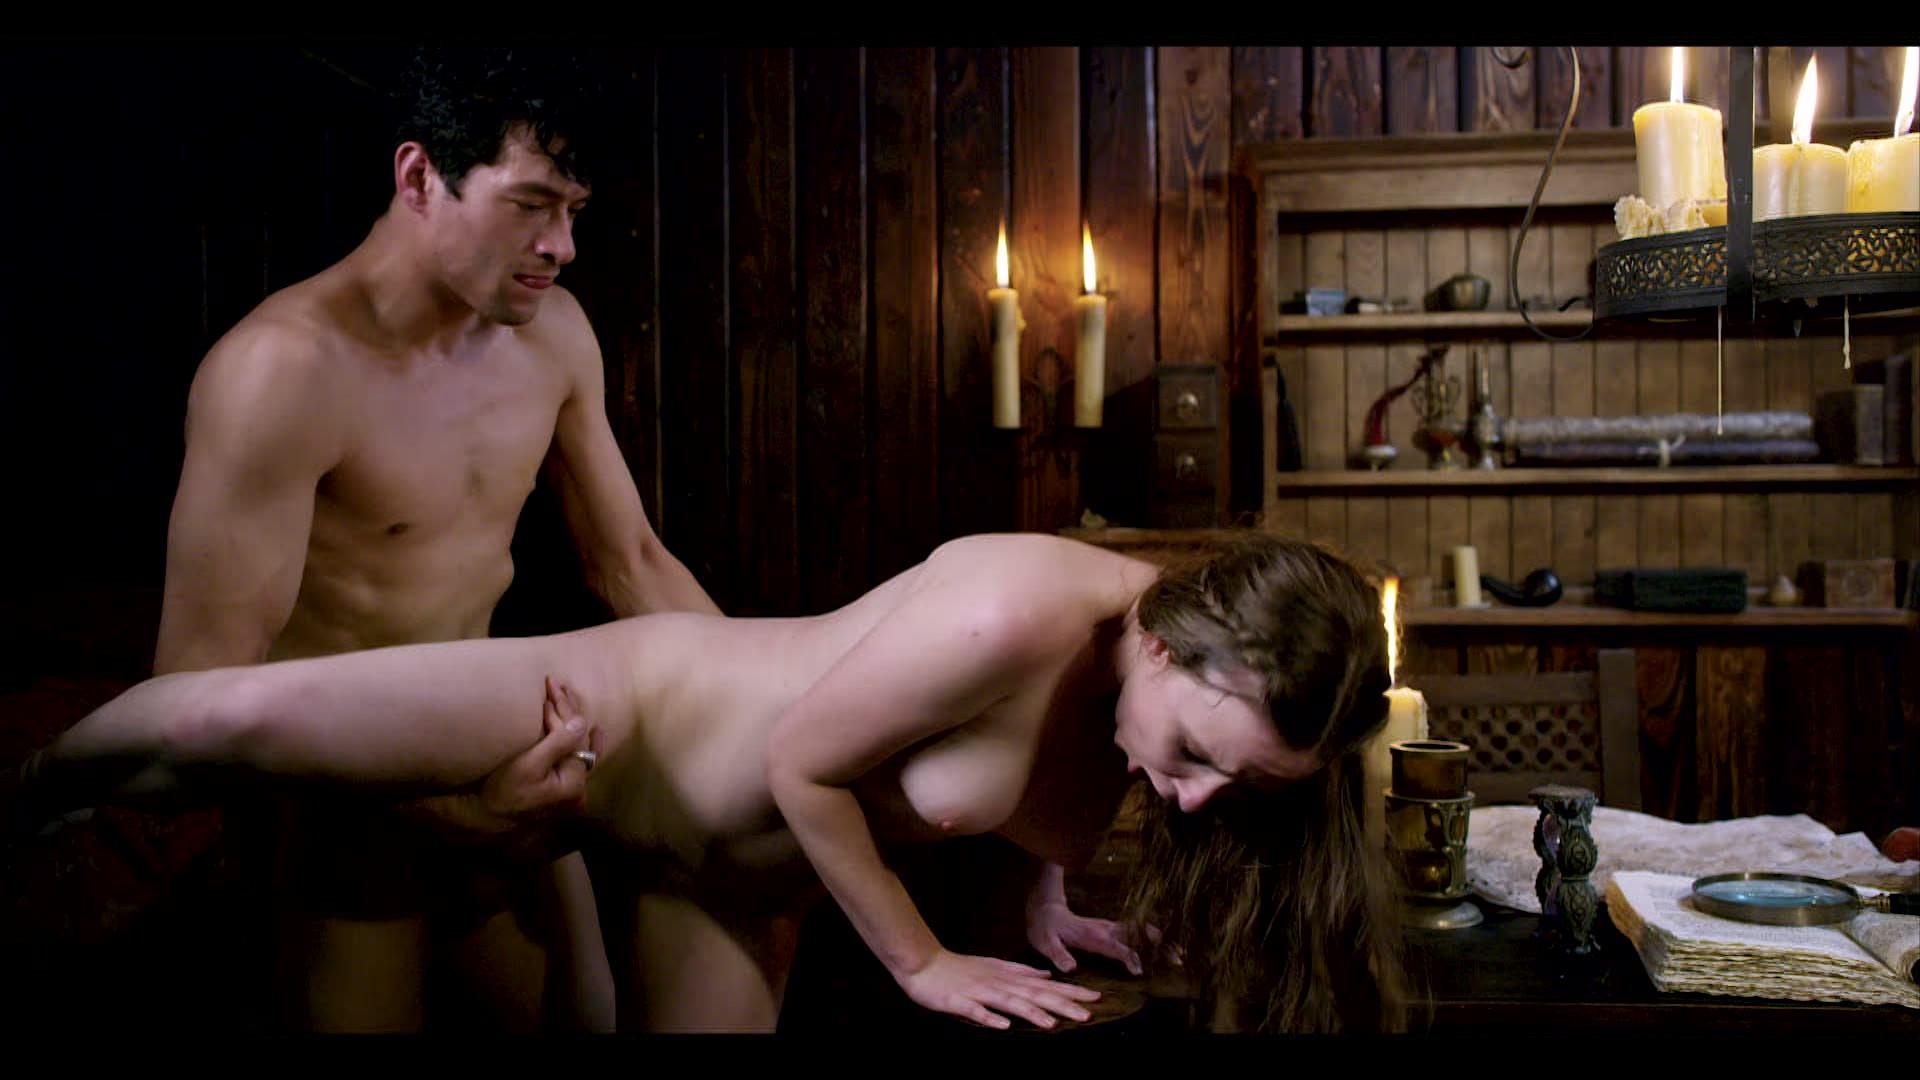 Baremwidends Porn Film Online Free sacrementum (2019) | adult dvd empire